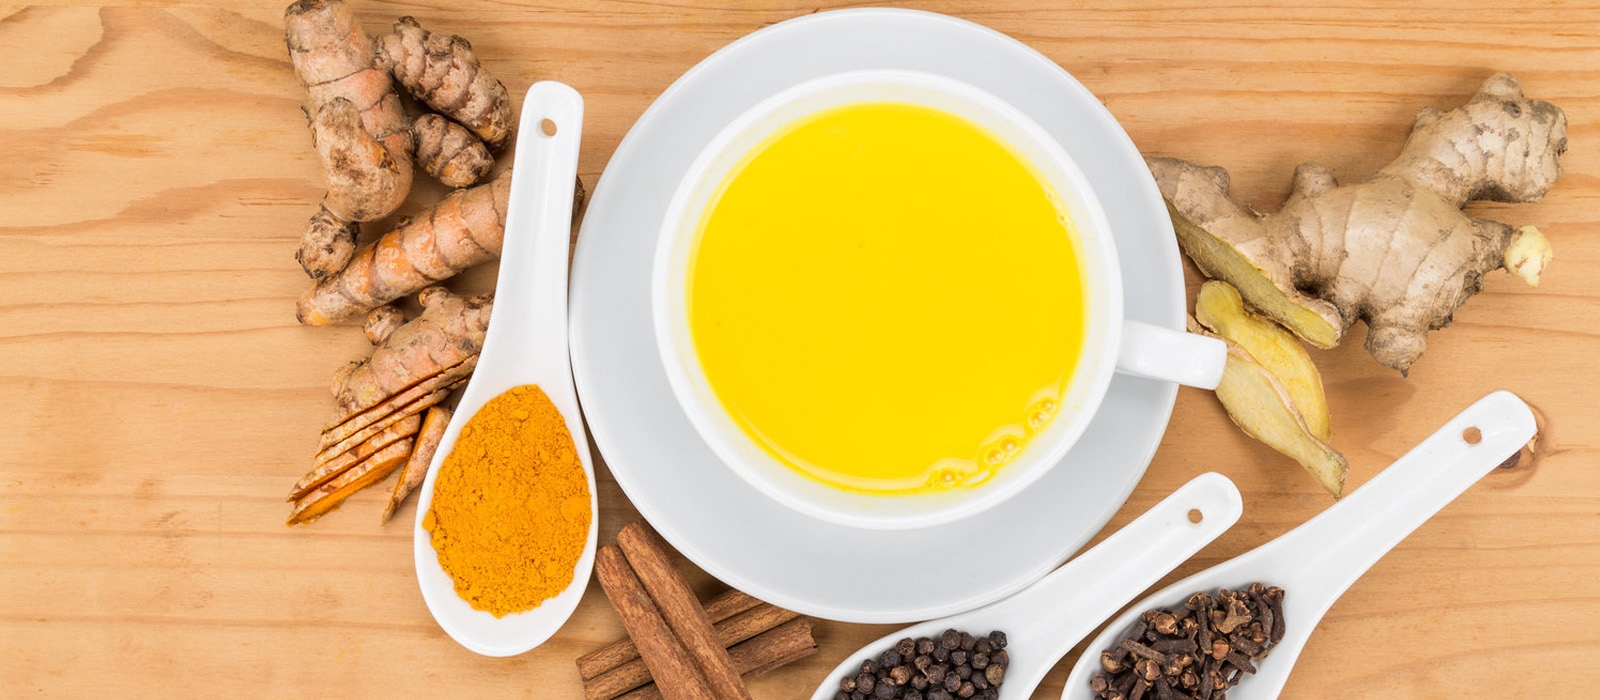 7 Amazing Benefits Of Ginger Tea And Turmeric